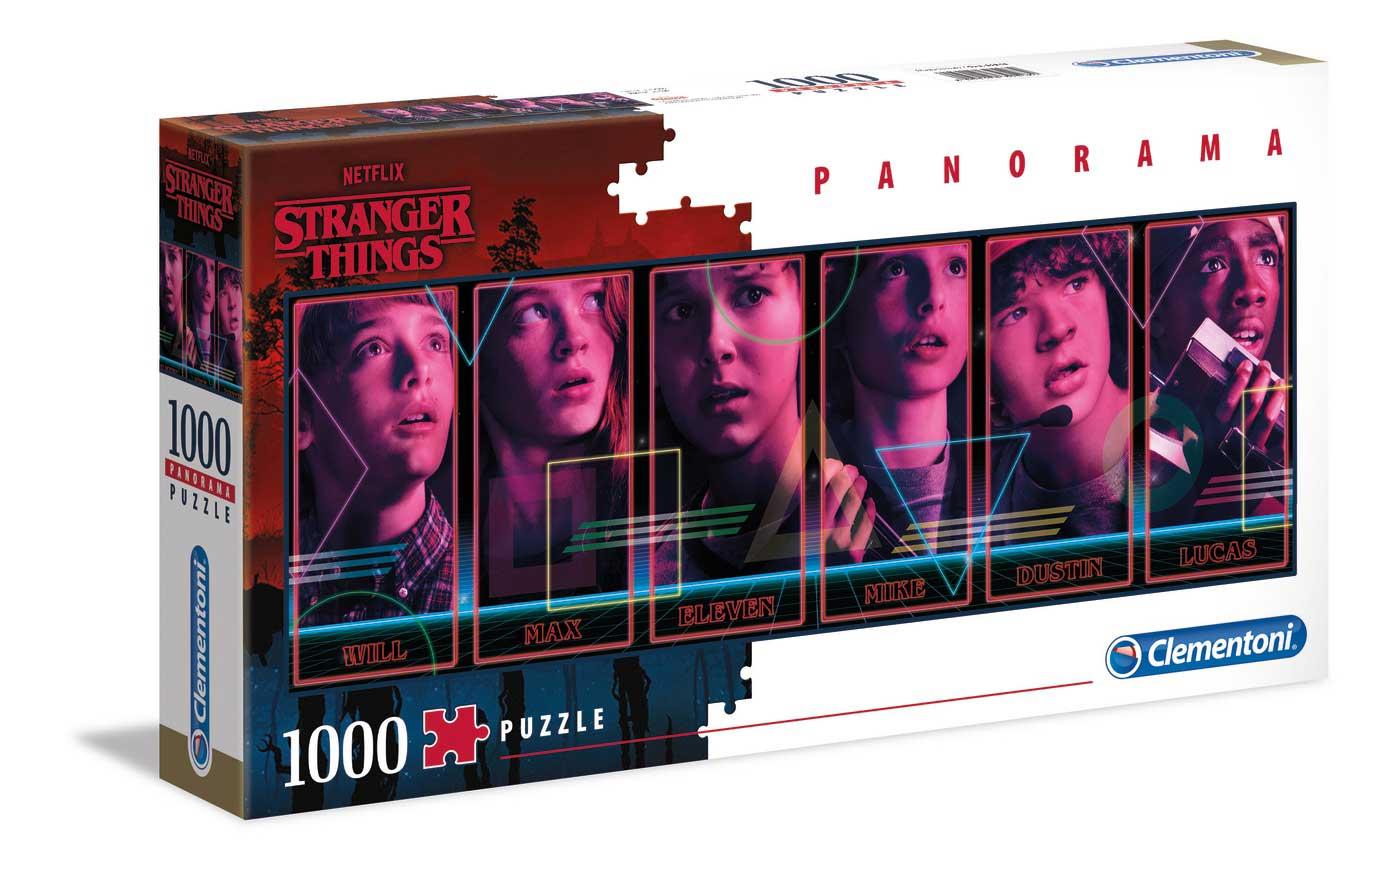 Puzzle Clementoni Stranger Things Panorama de 1000 Pzs